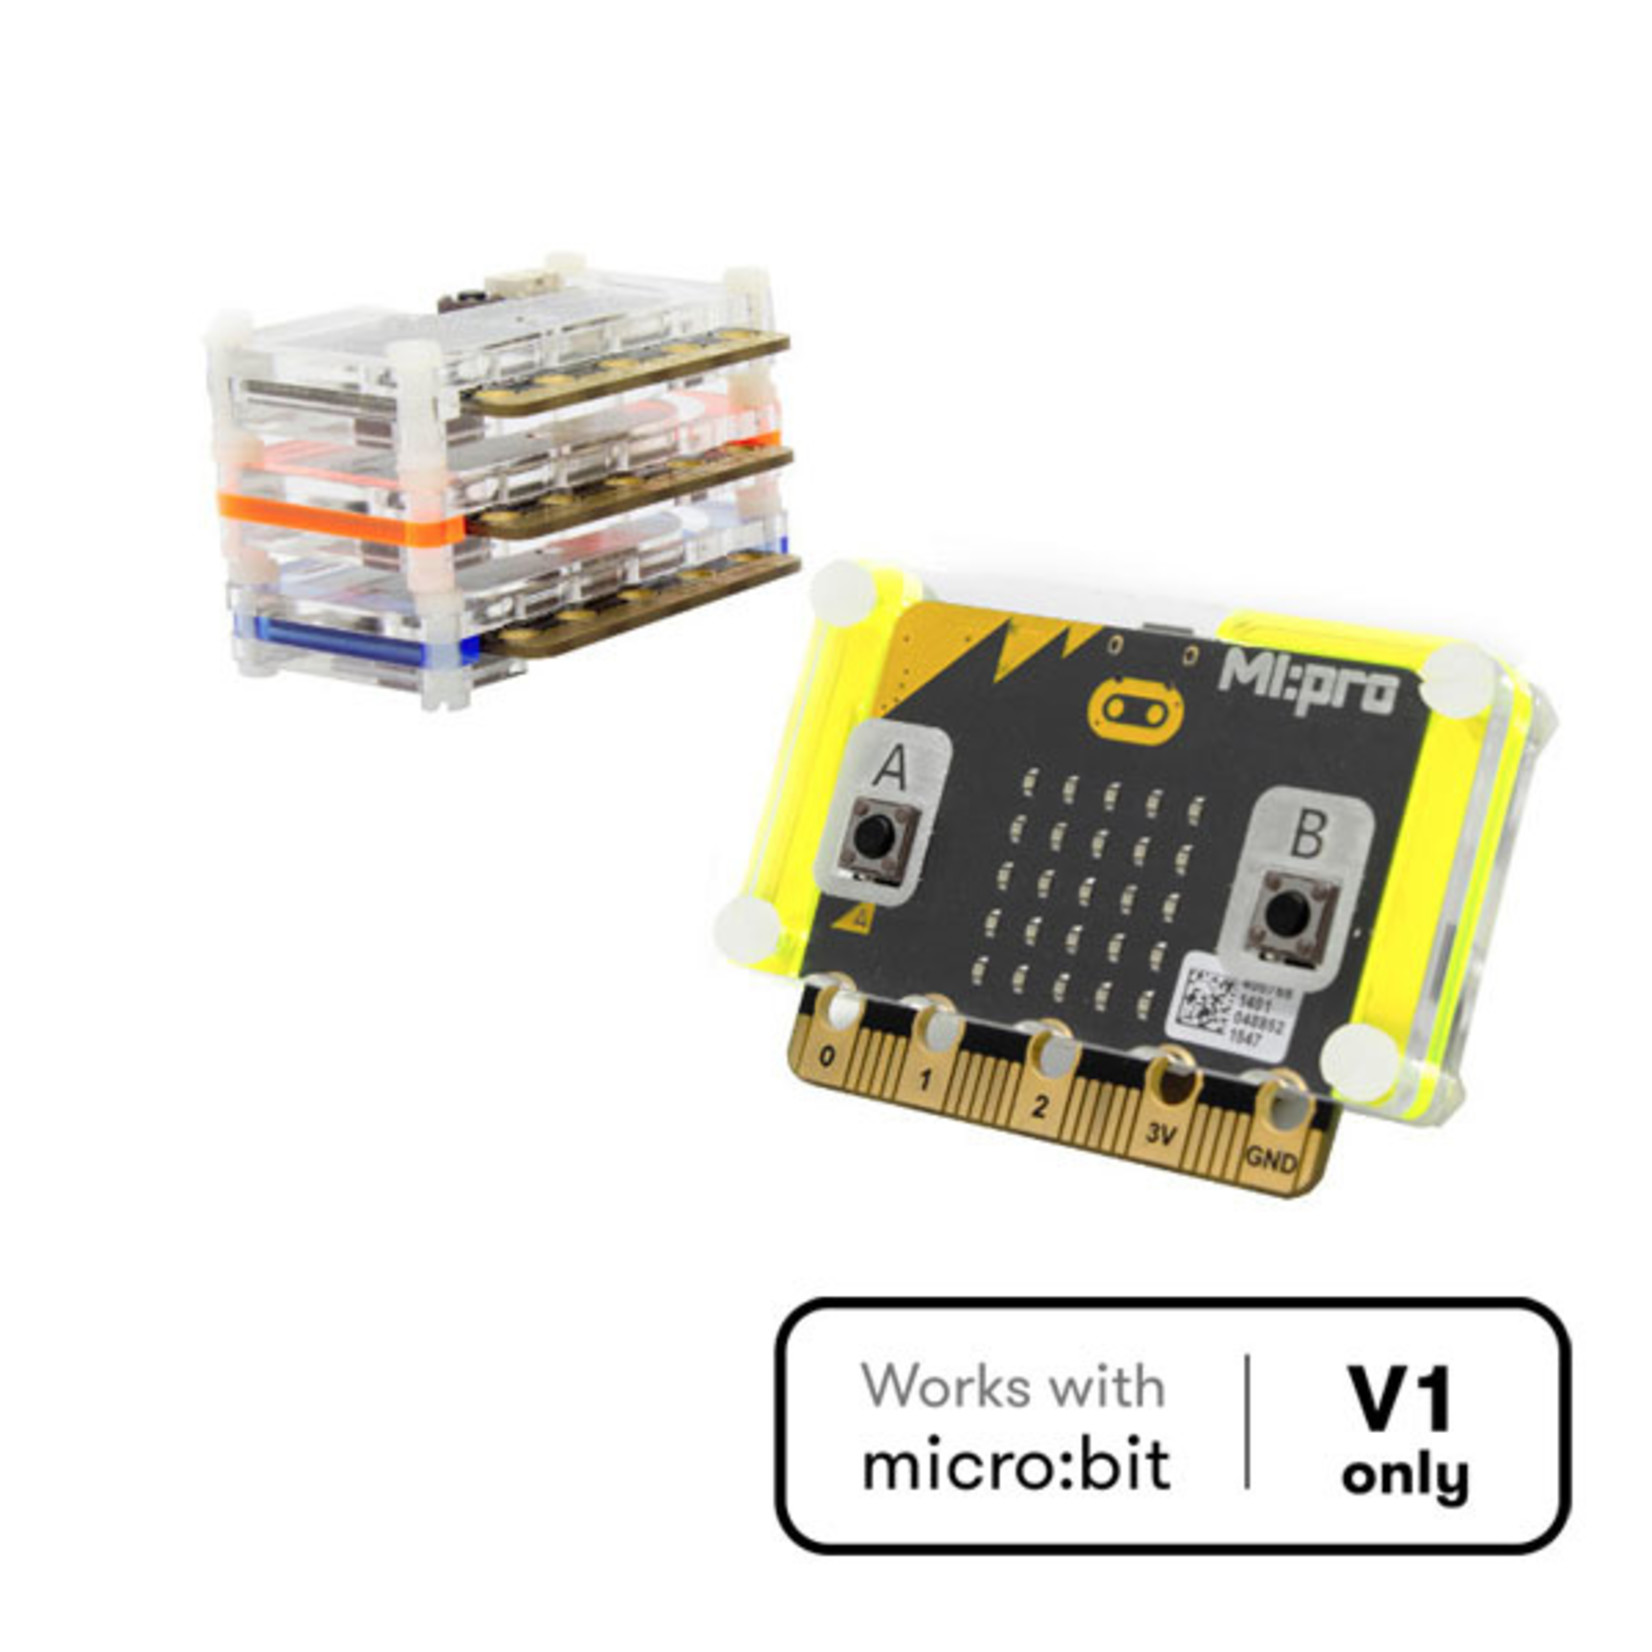 Kitronik MI:pro Protector Case for the BBC micro:bit - Blue